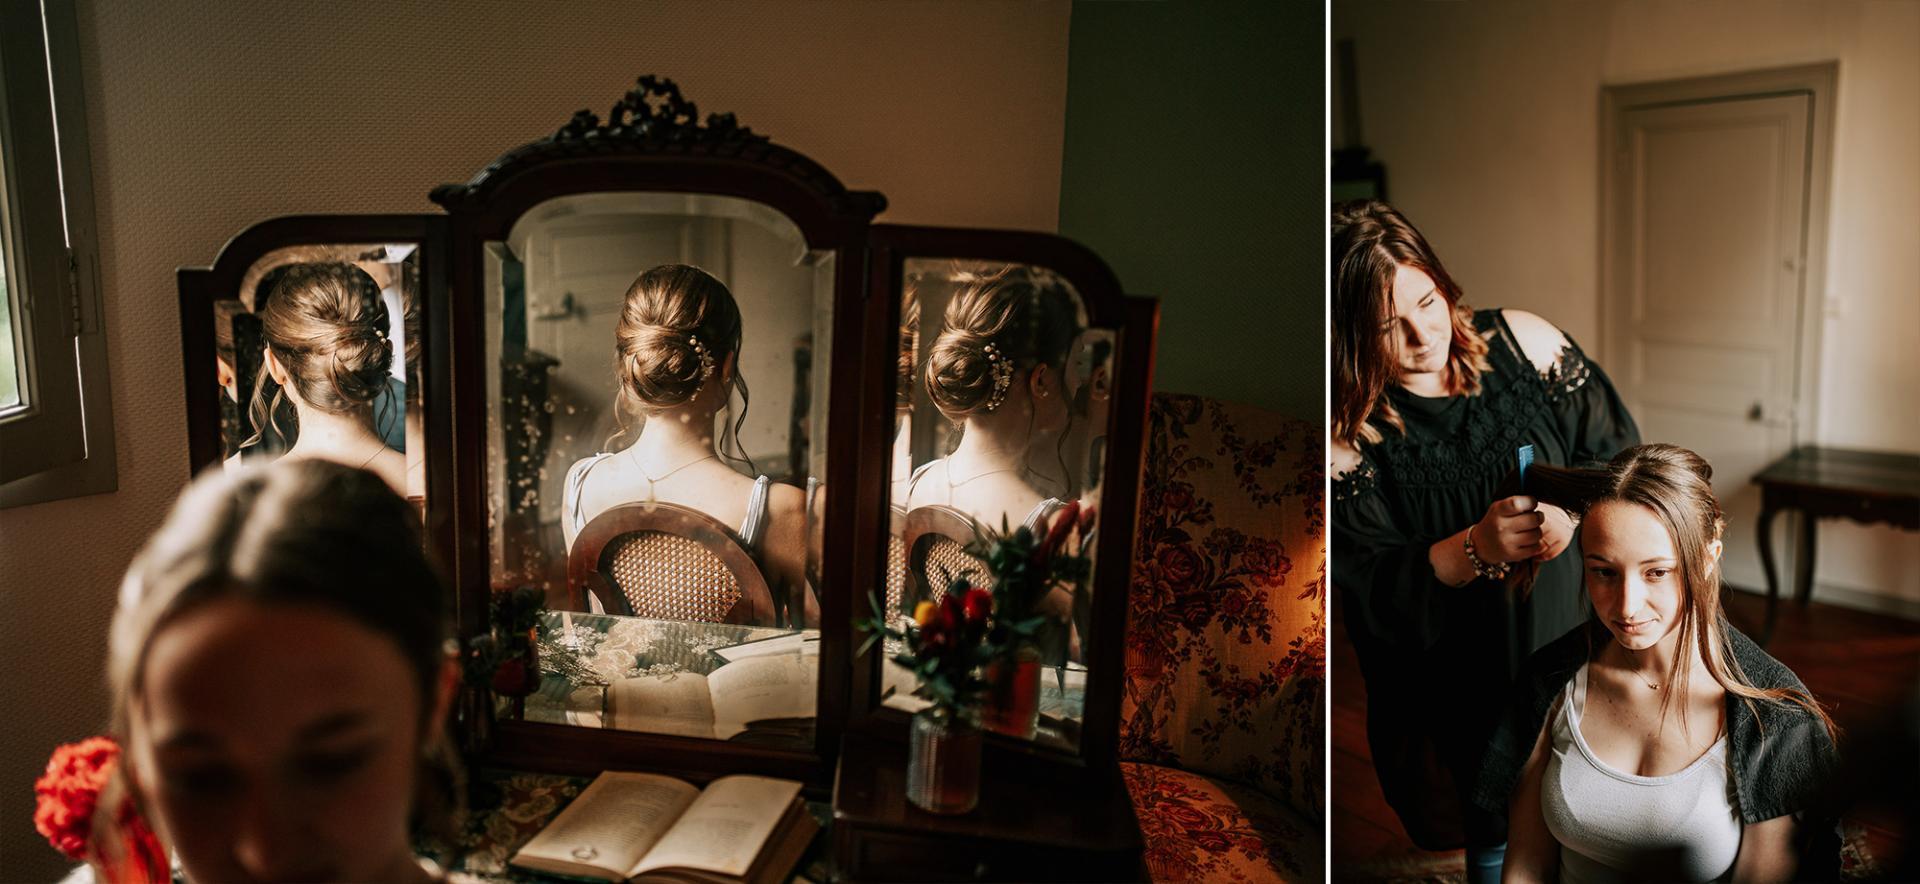 2 photographe landes dax mariage allison micallef famille